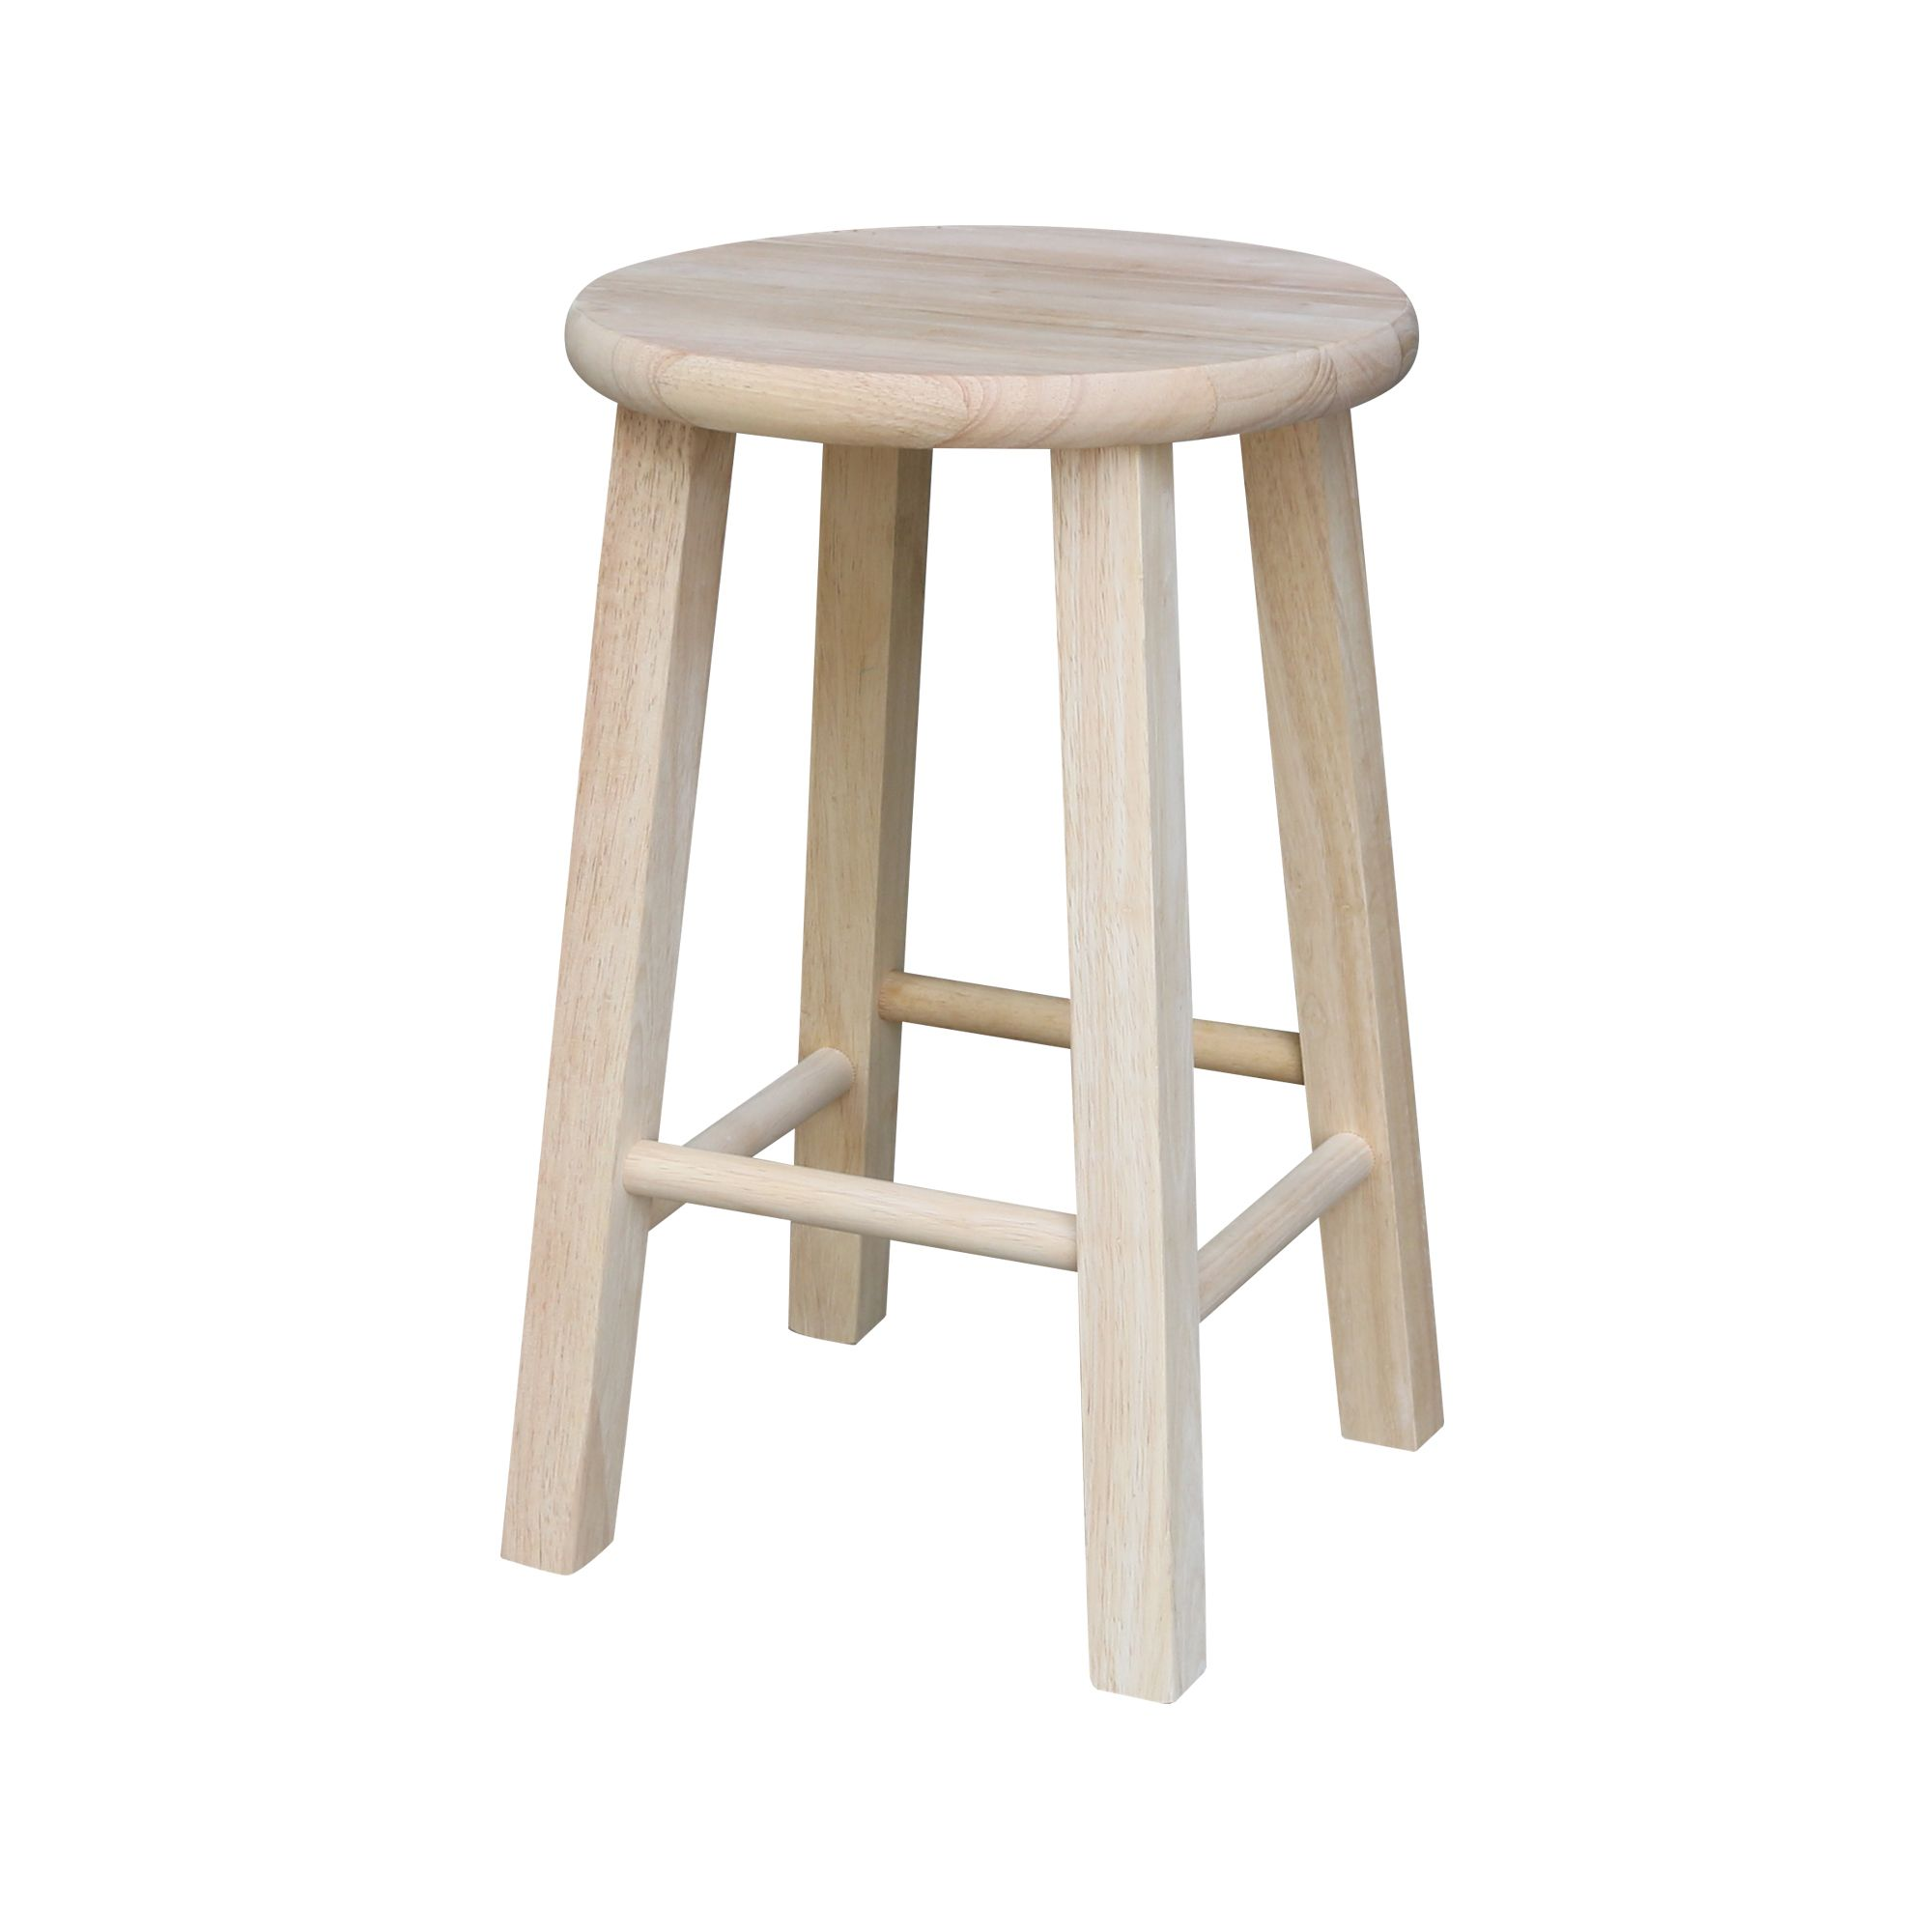 Round Top Stool 18 Seat Height Walmart Com Wooden Stools Wood Bar Stools Stool